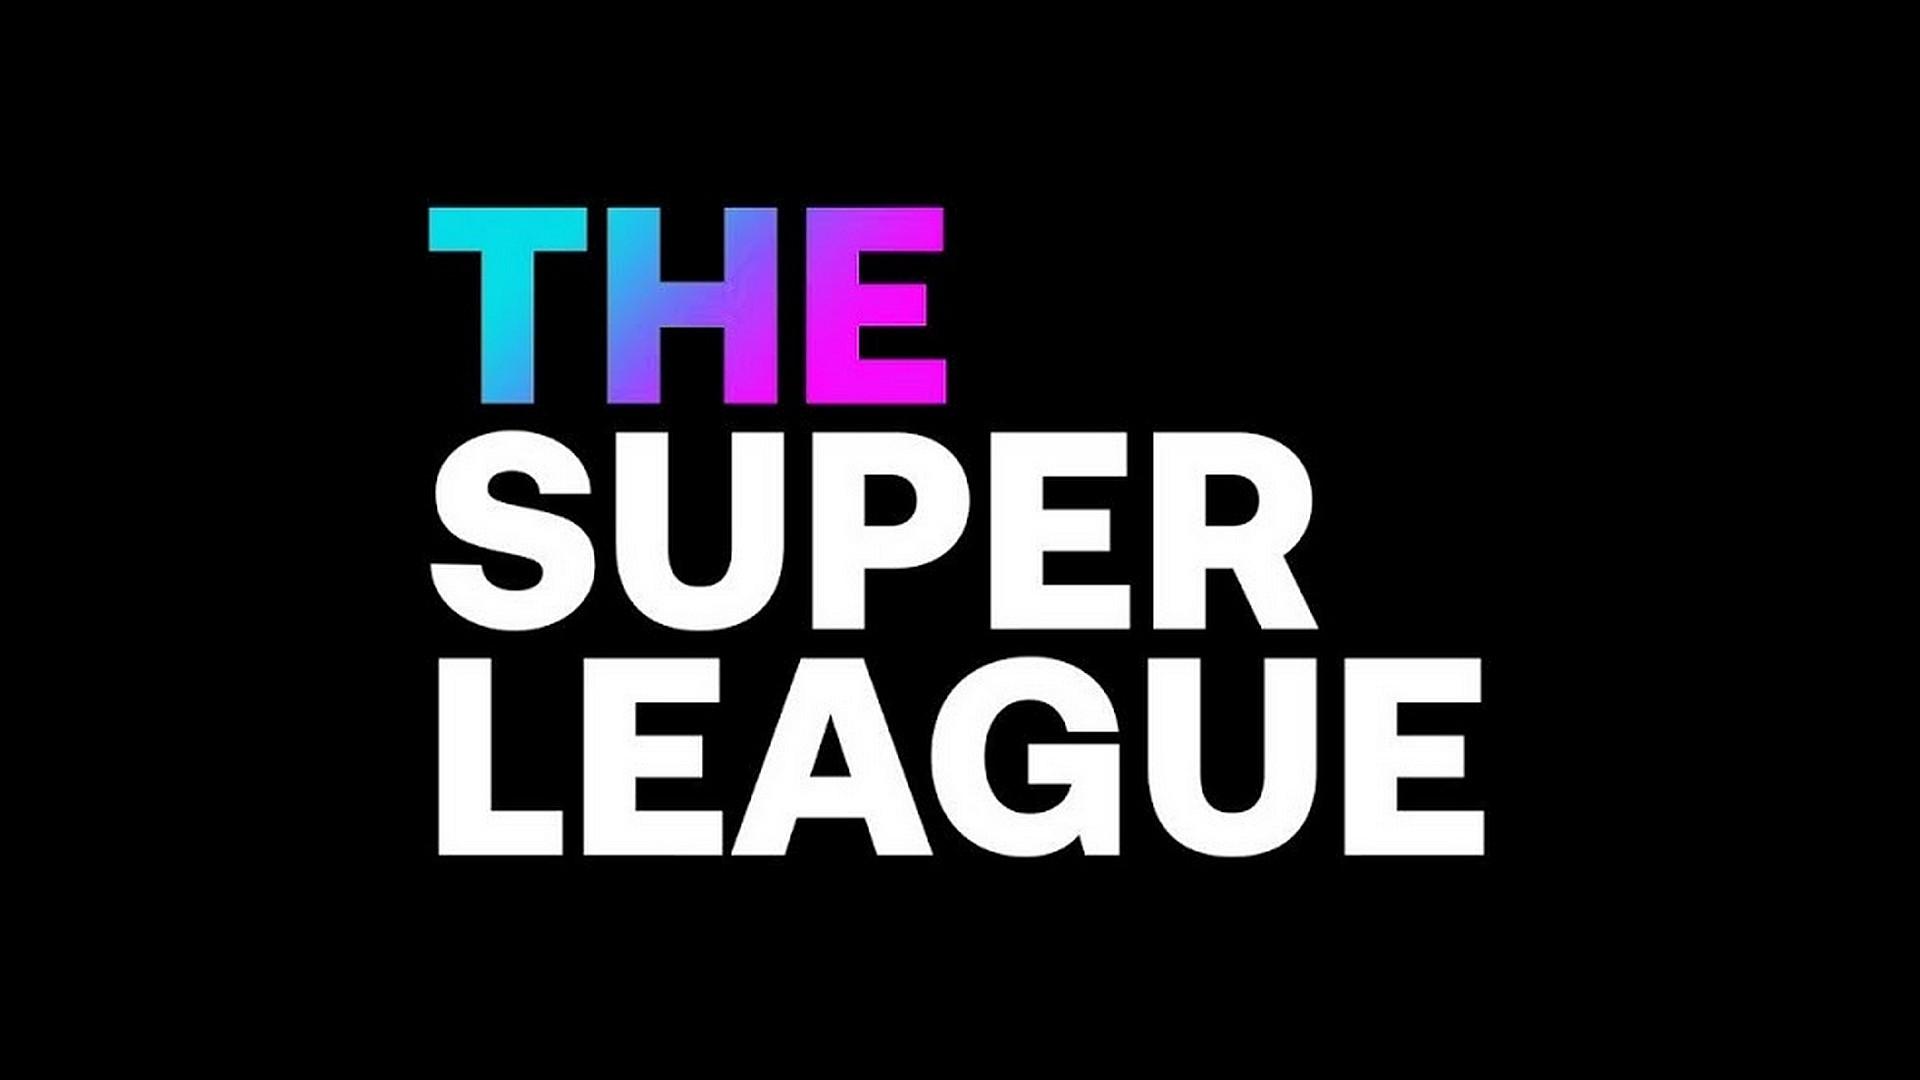 Football – The Super League (1) Logo